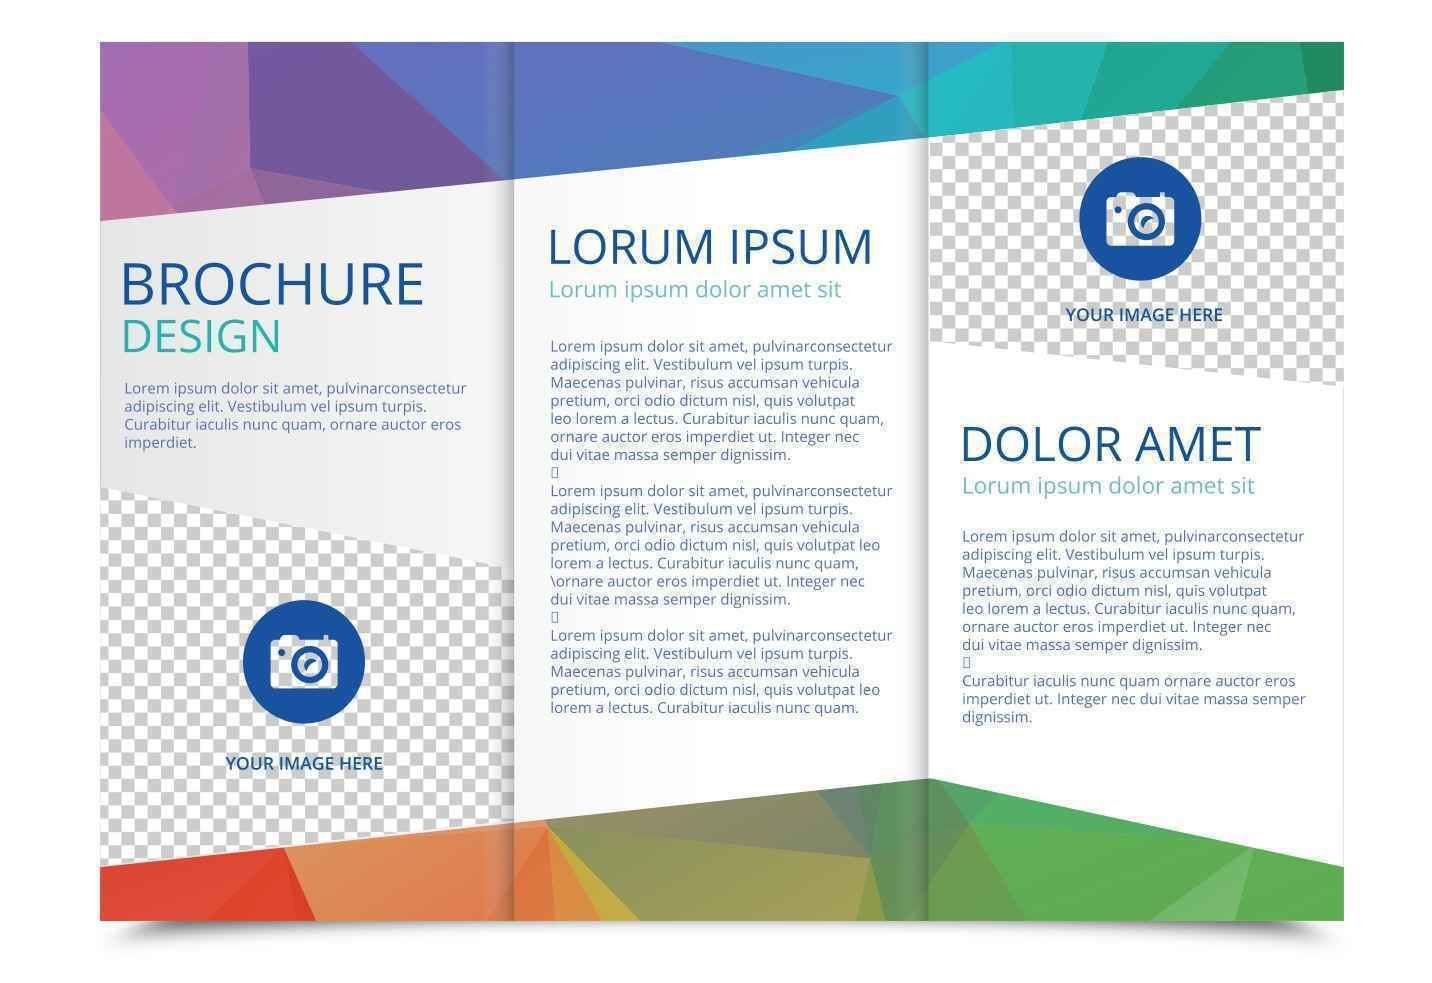 001 Formidable Tri Fold Brochure Template Word Sample  2010 2007 FreeFull